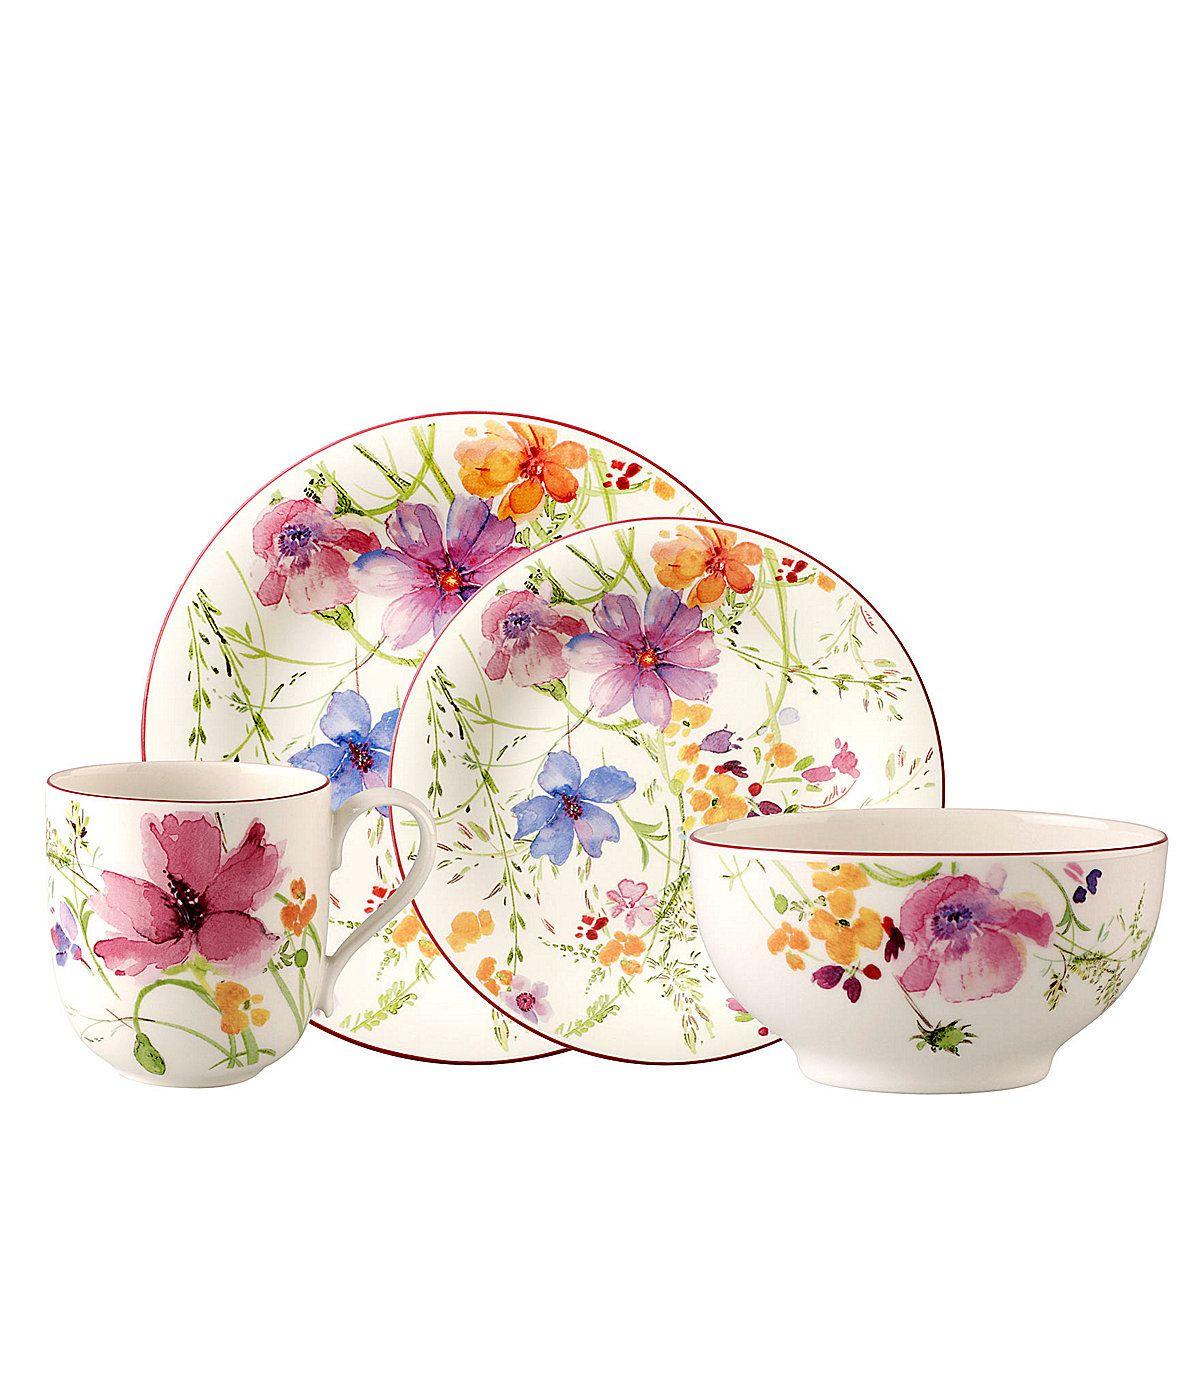 Villeroy Boch Mariefleur Dinnerware Dillards Com With Images